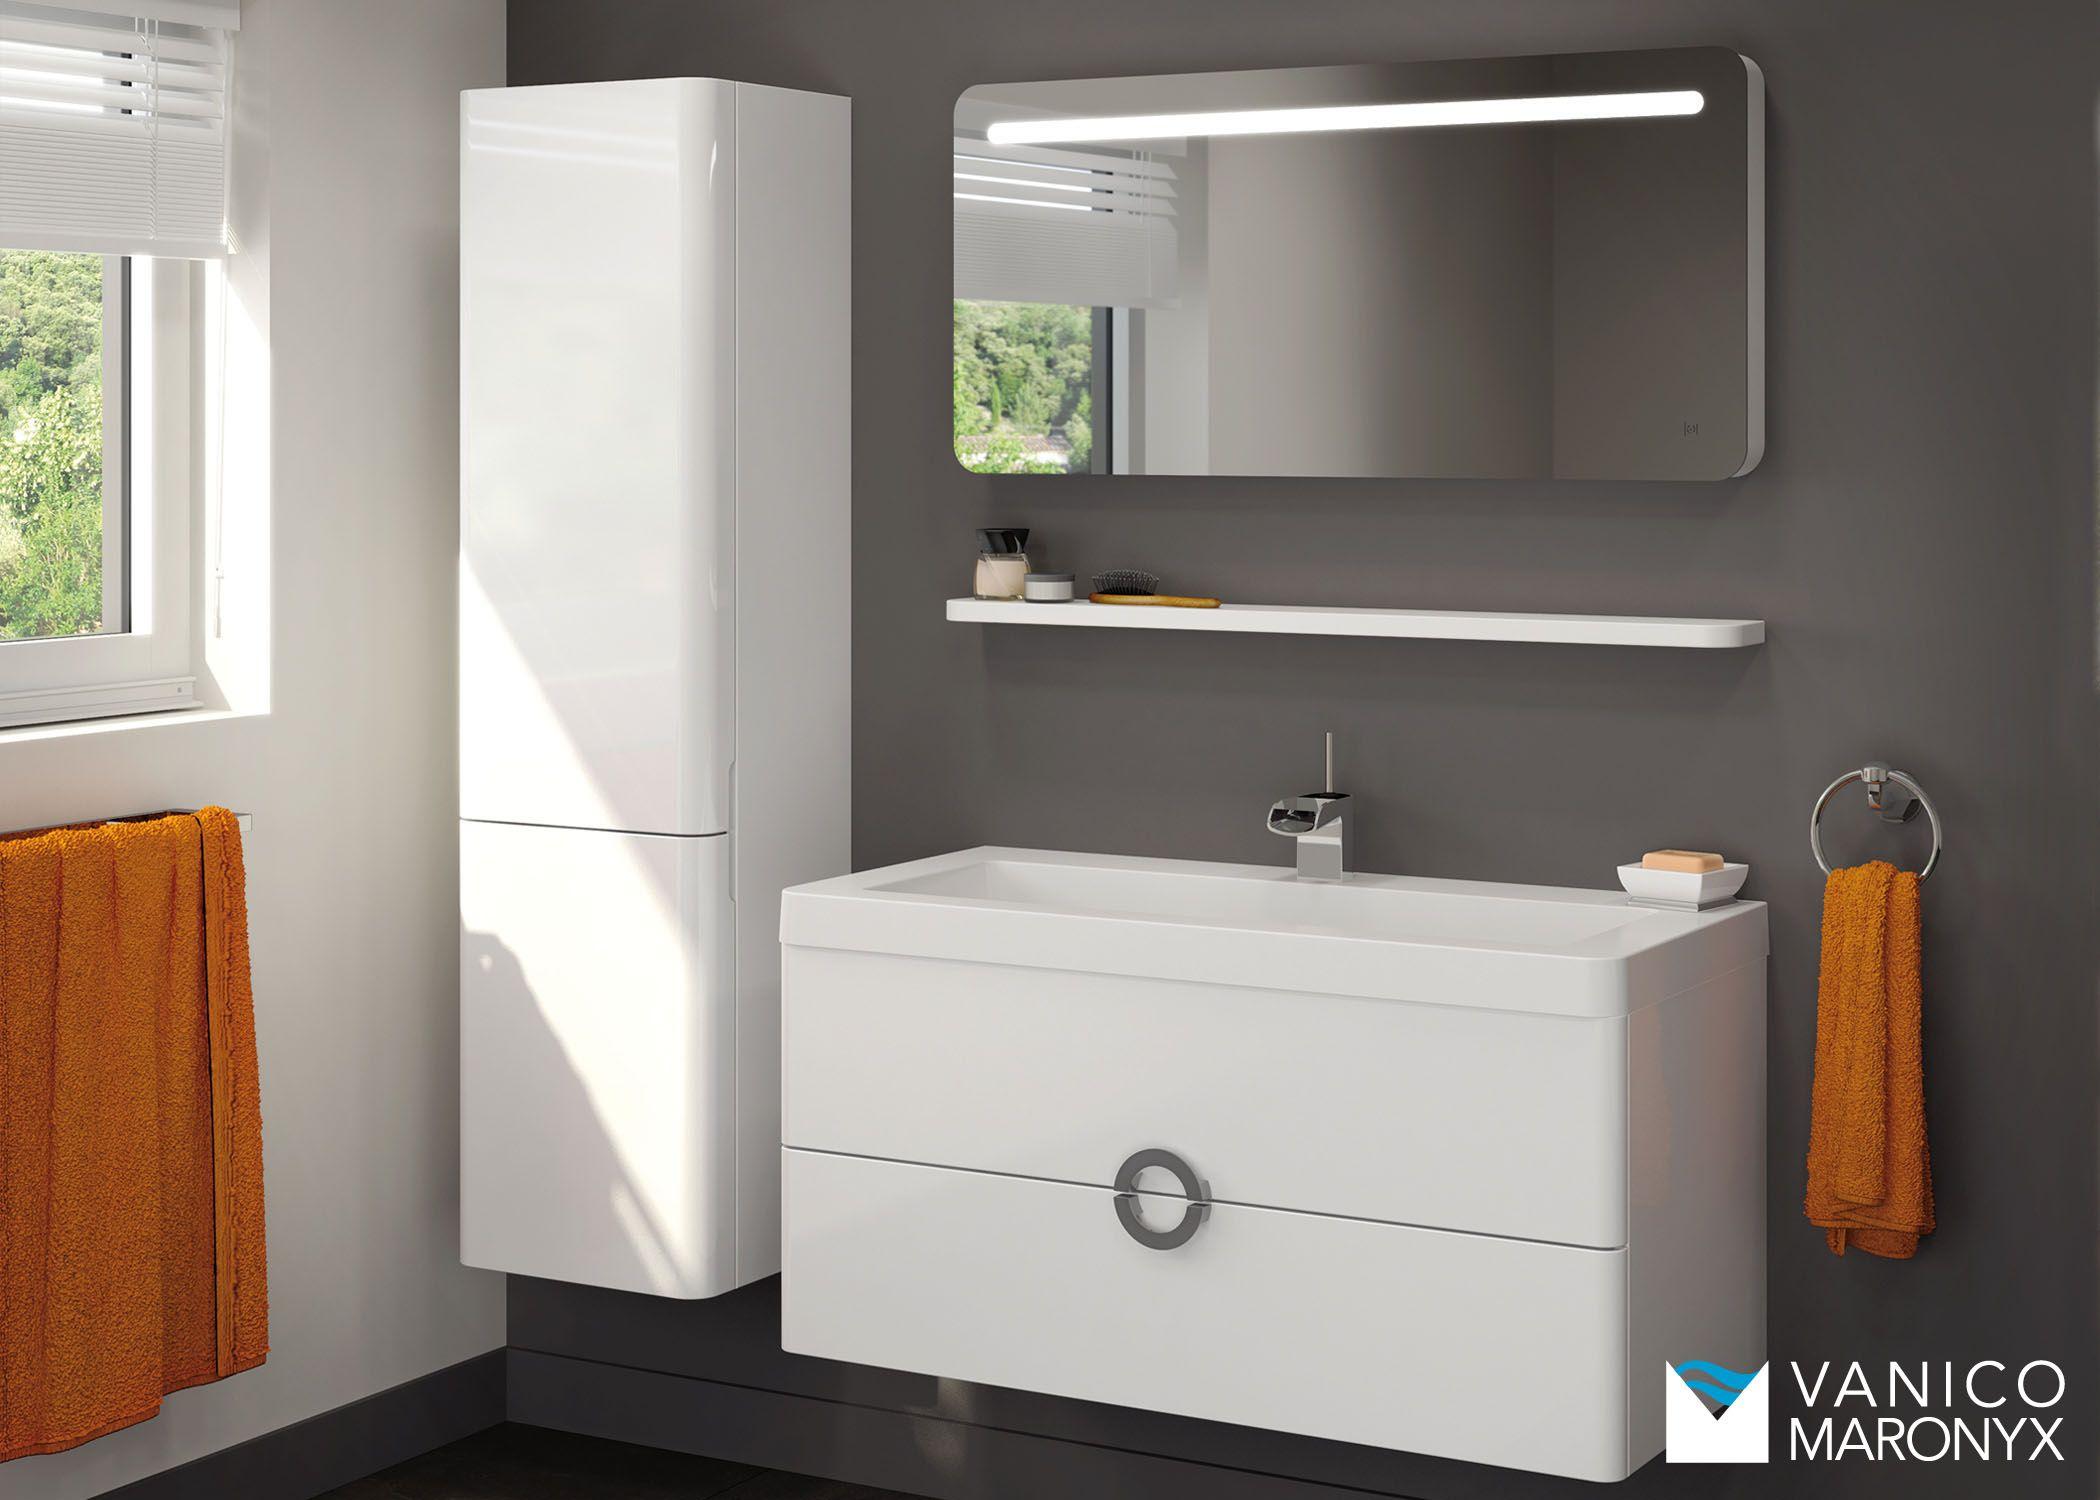 Bathroom Sinks Montreal mobilier de salle de bain soprano de la sÉrie express - vanico